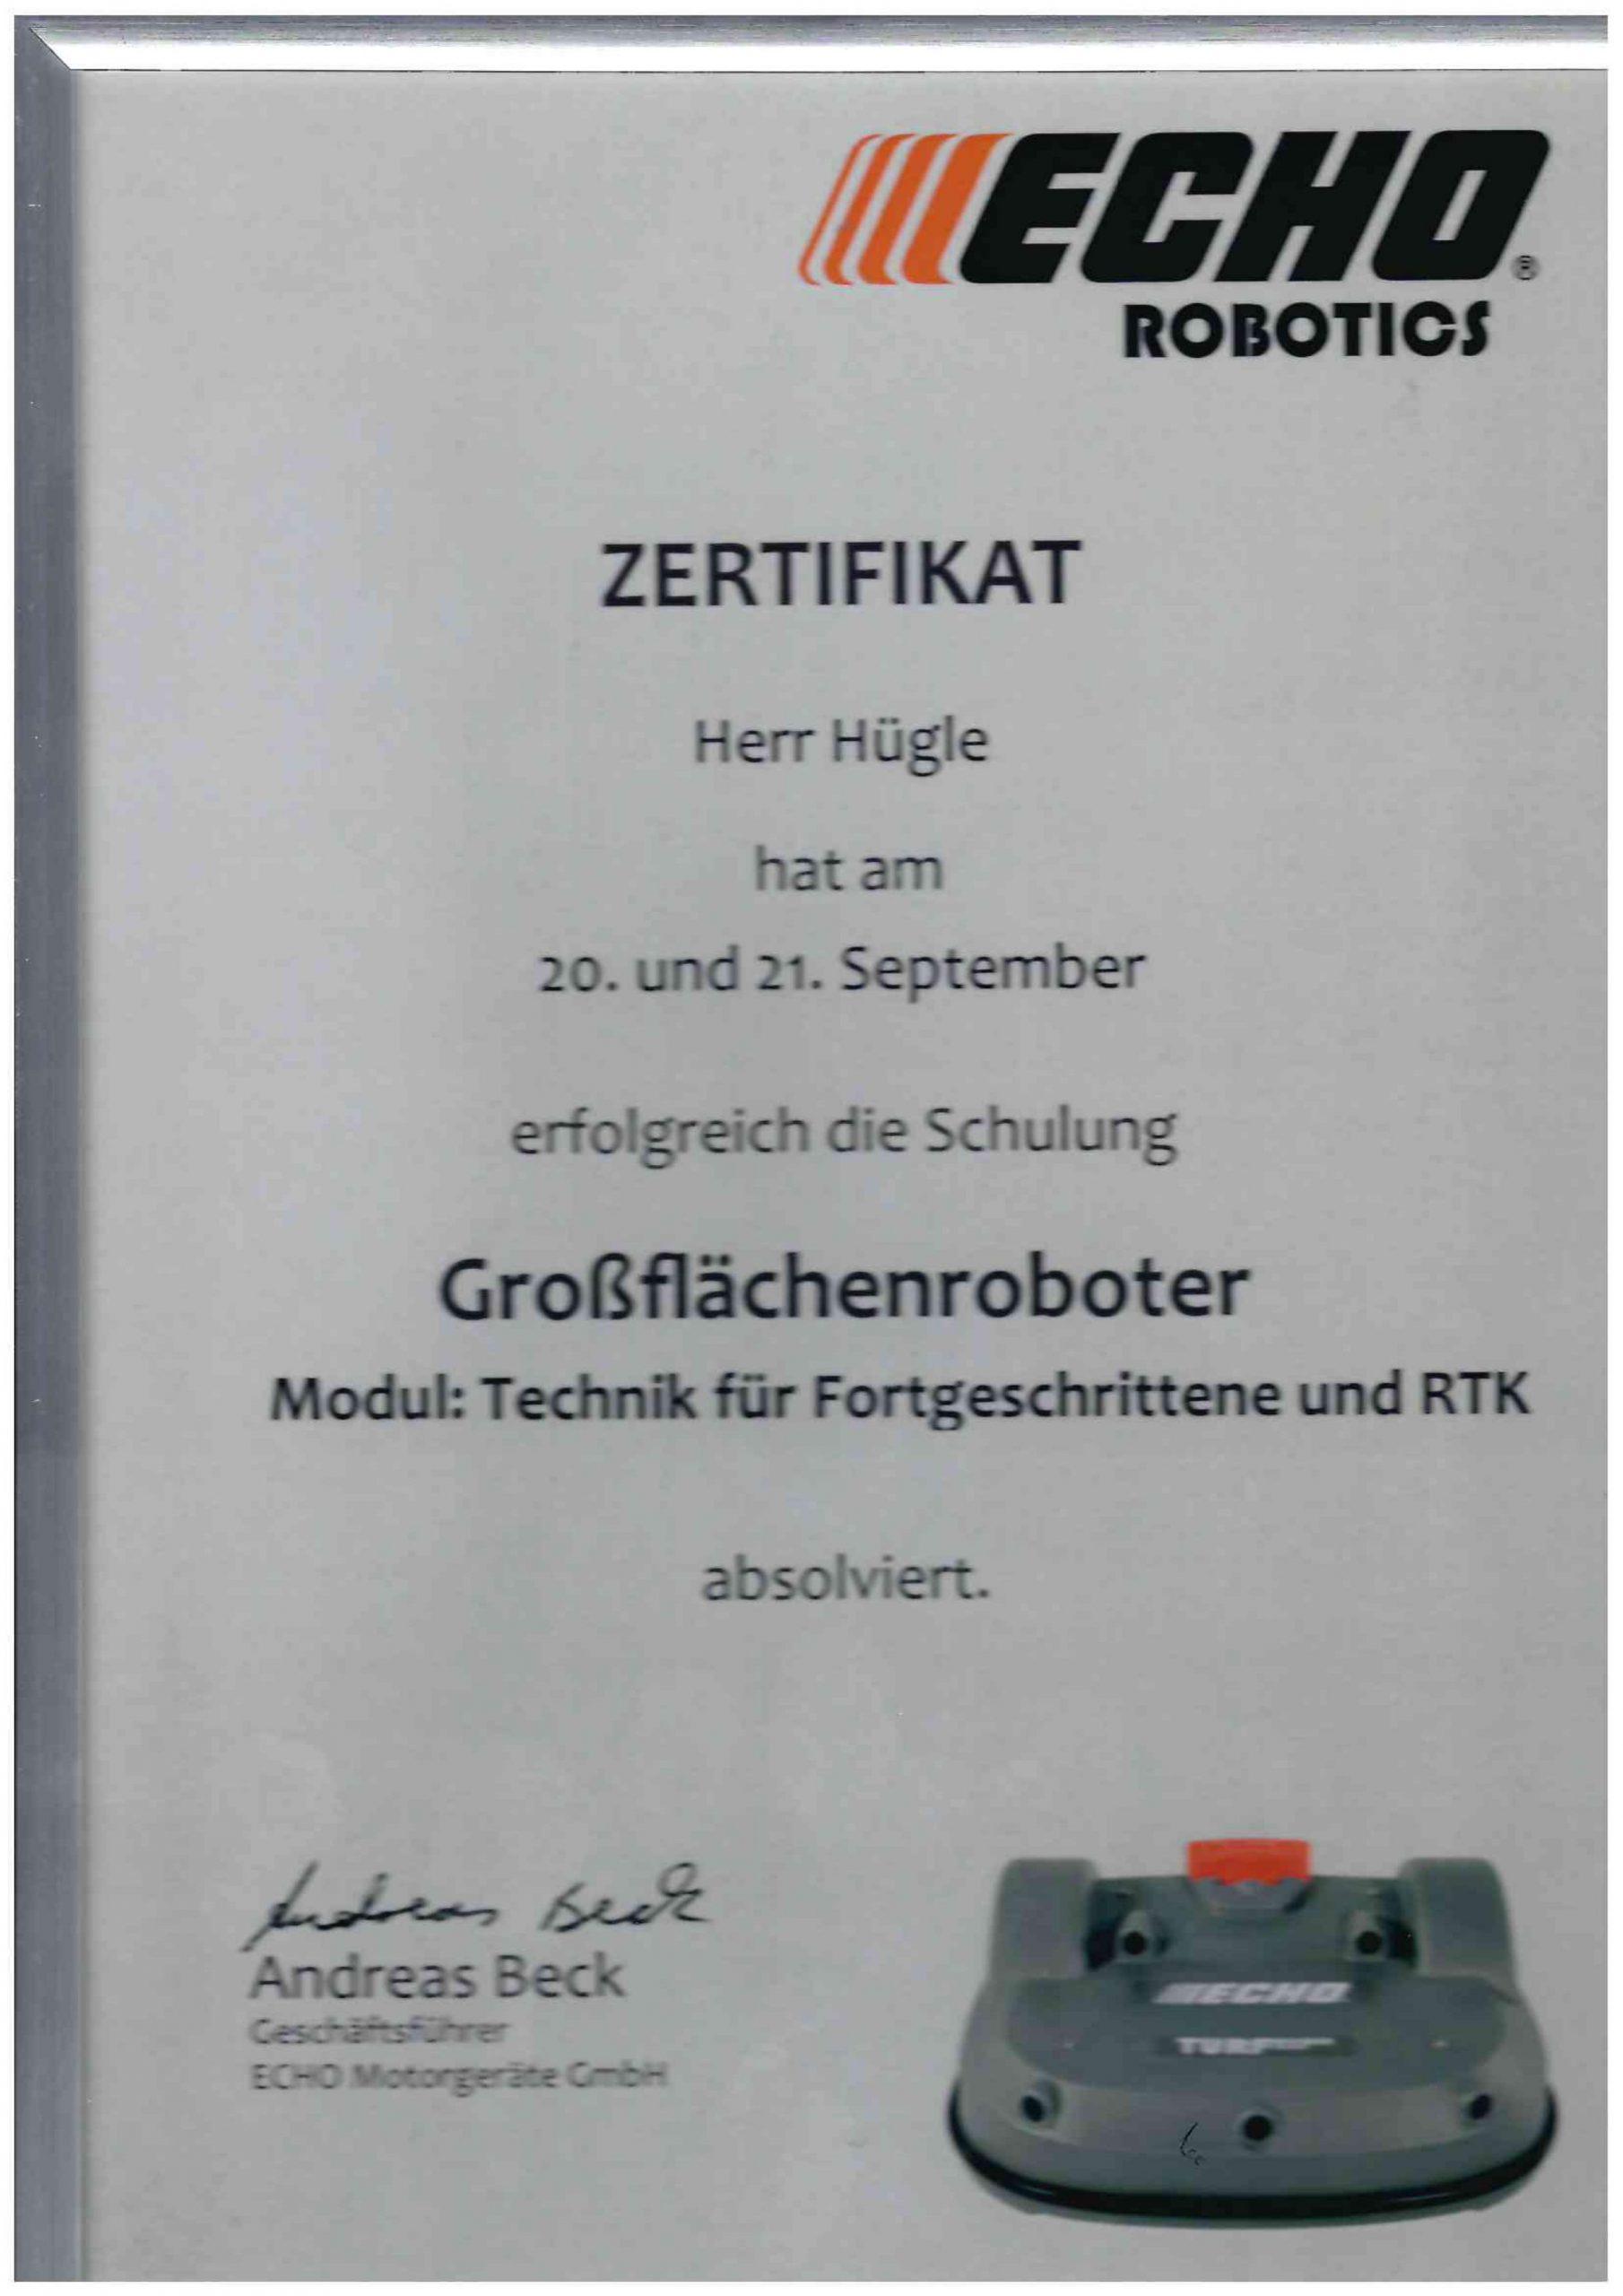 Zertifikat Herr Hügle